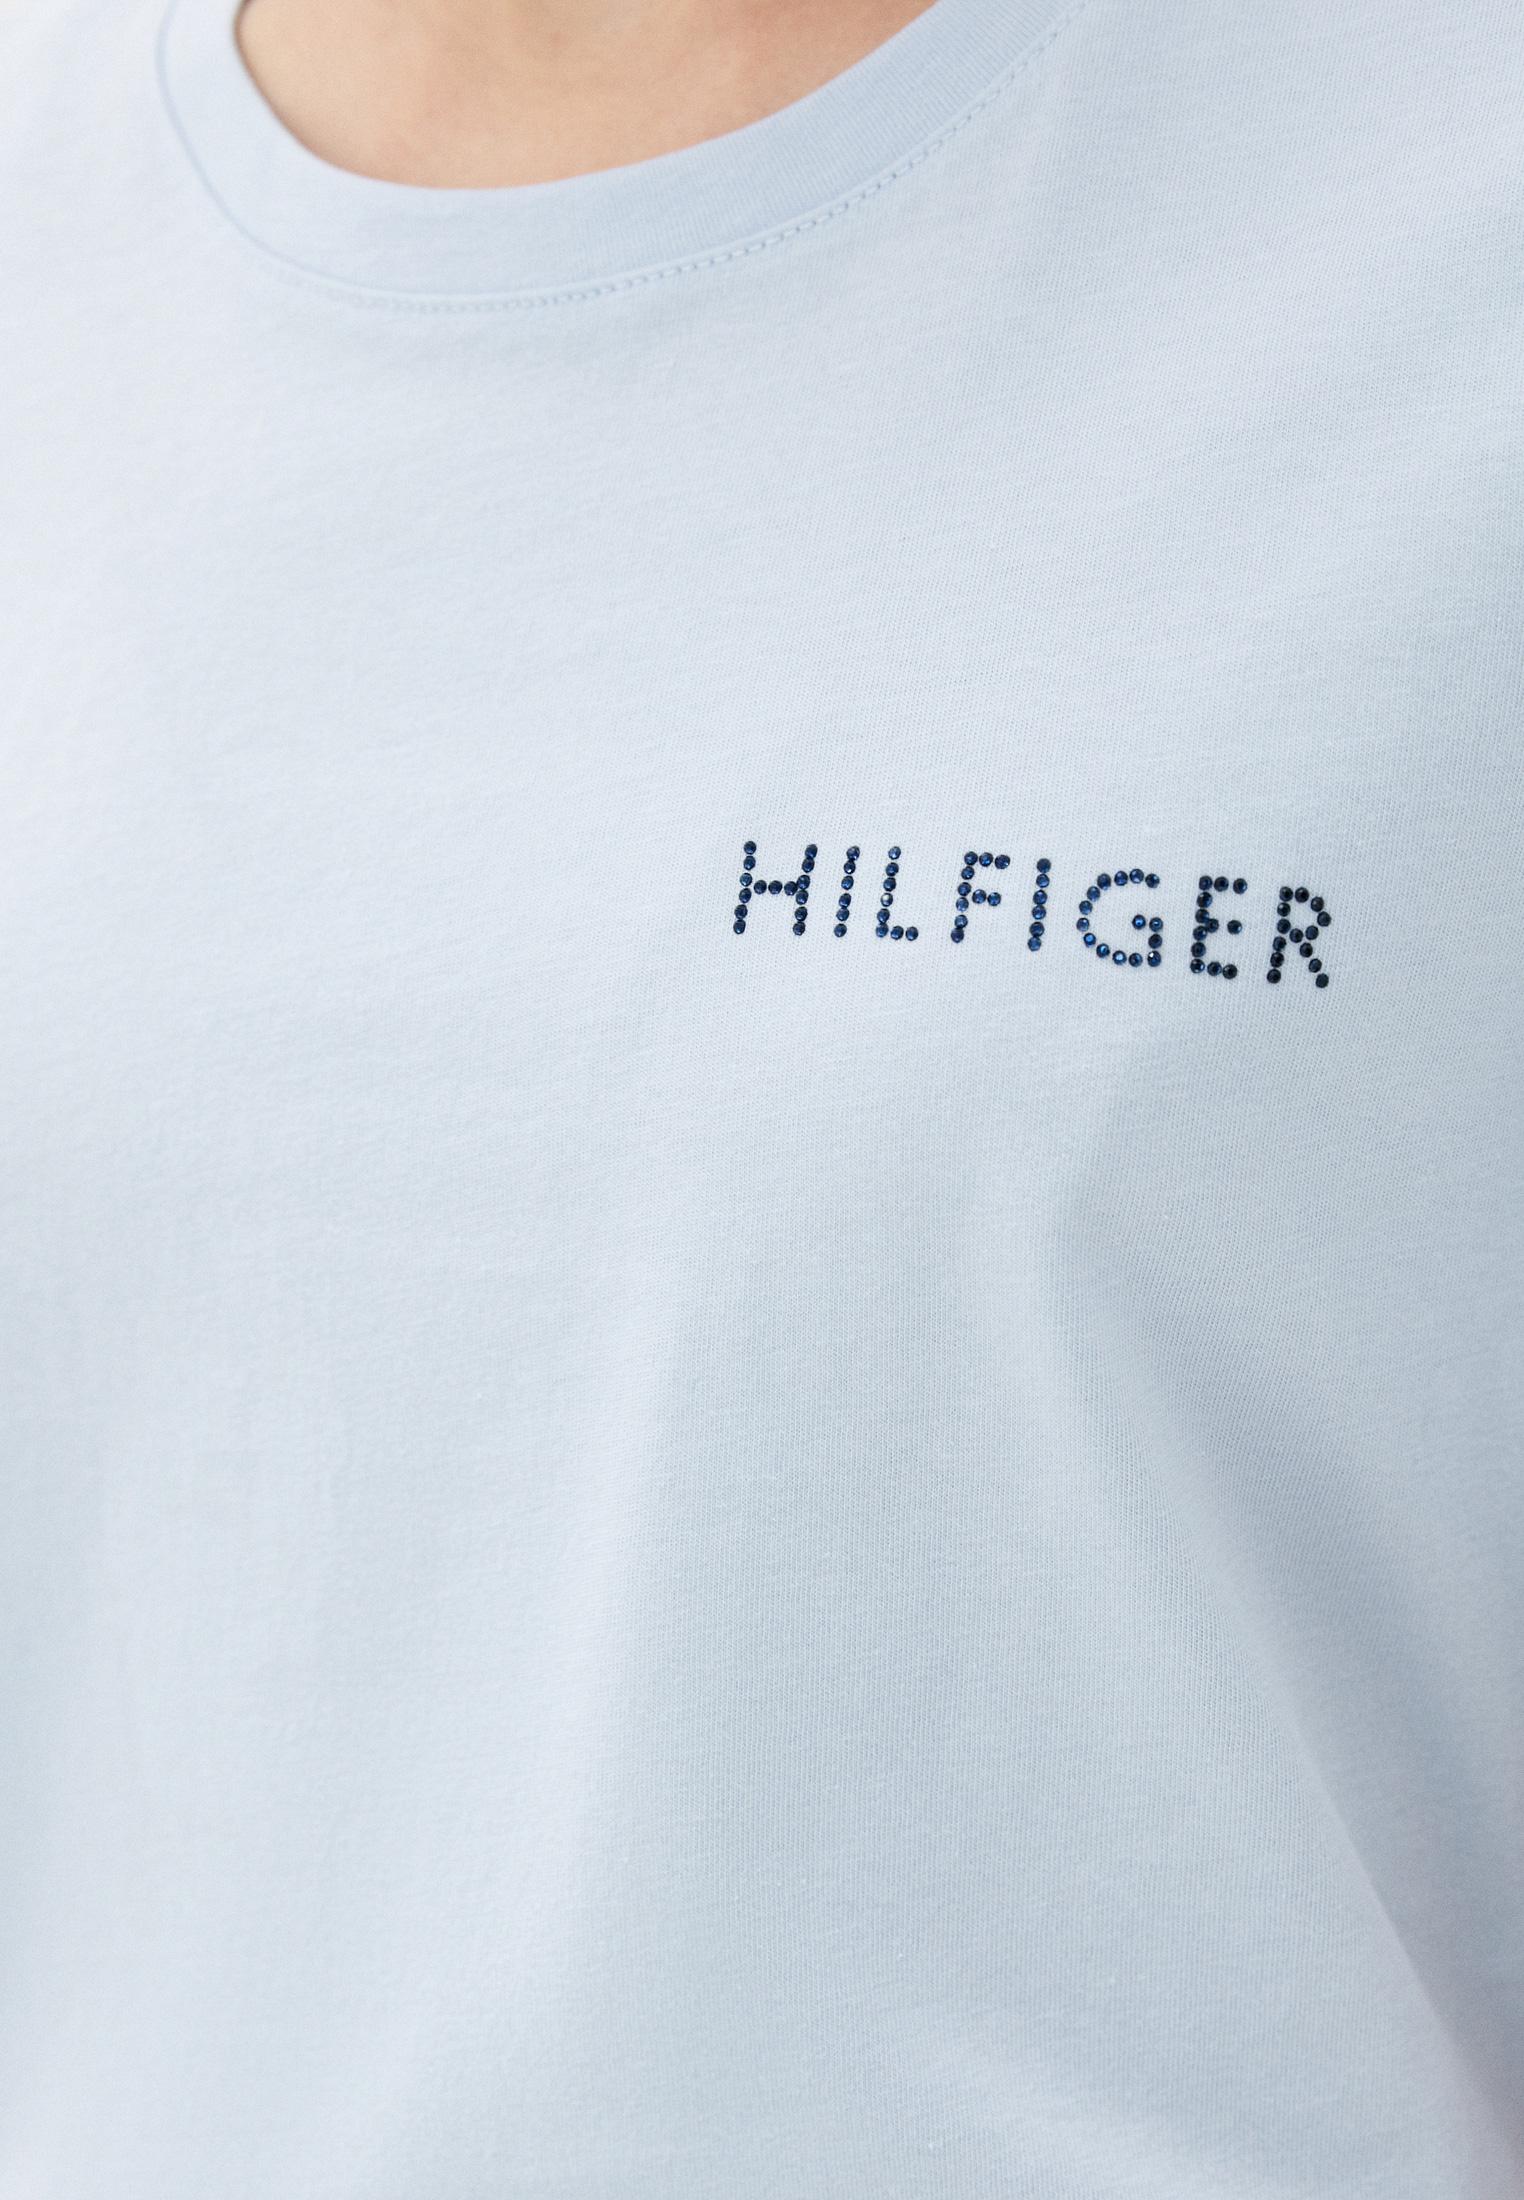 Футболка с коротким рукавом Tommy Hilfiger (Томми Хилфигер) WW0WW29980: изображение 3